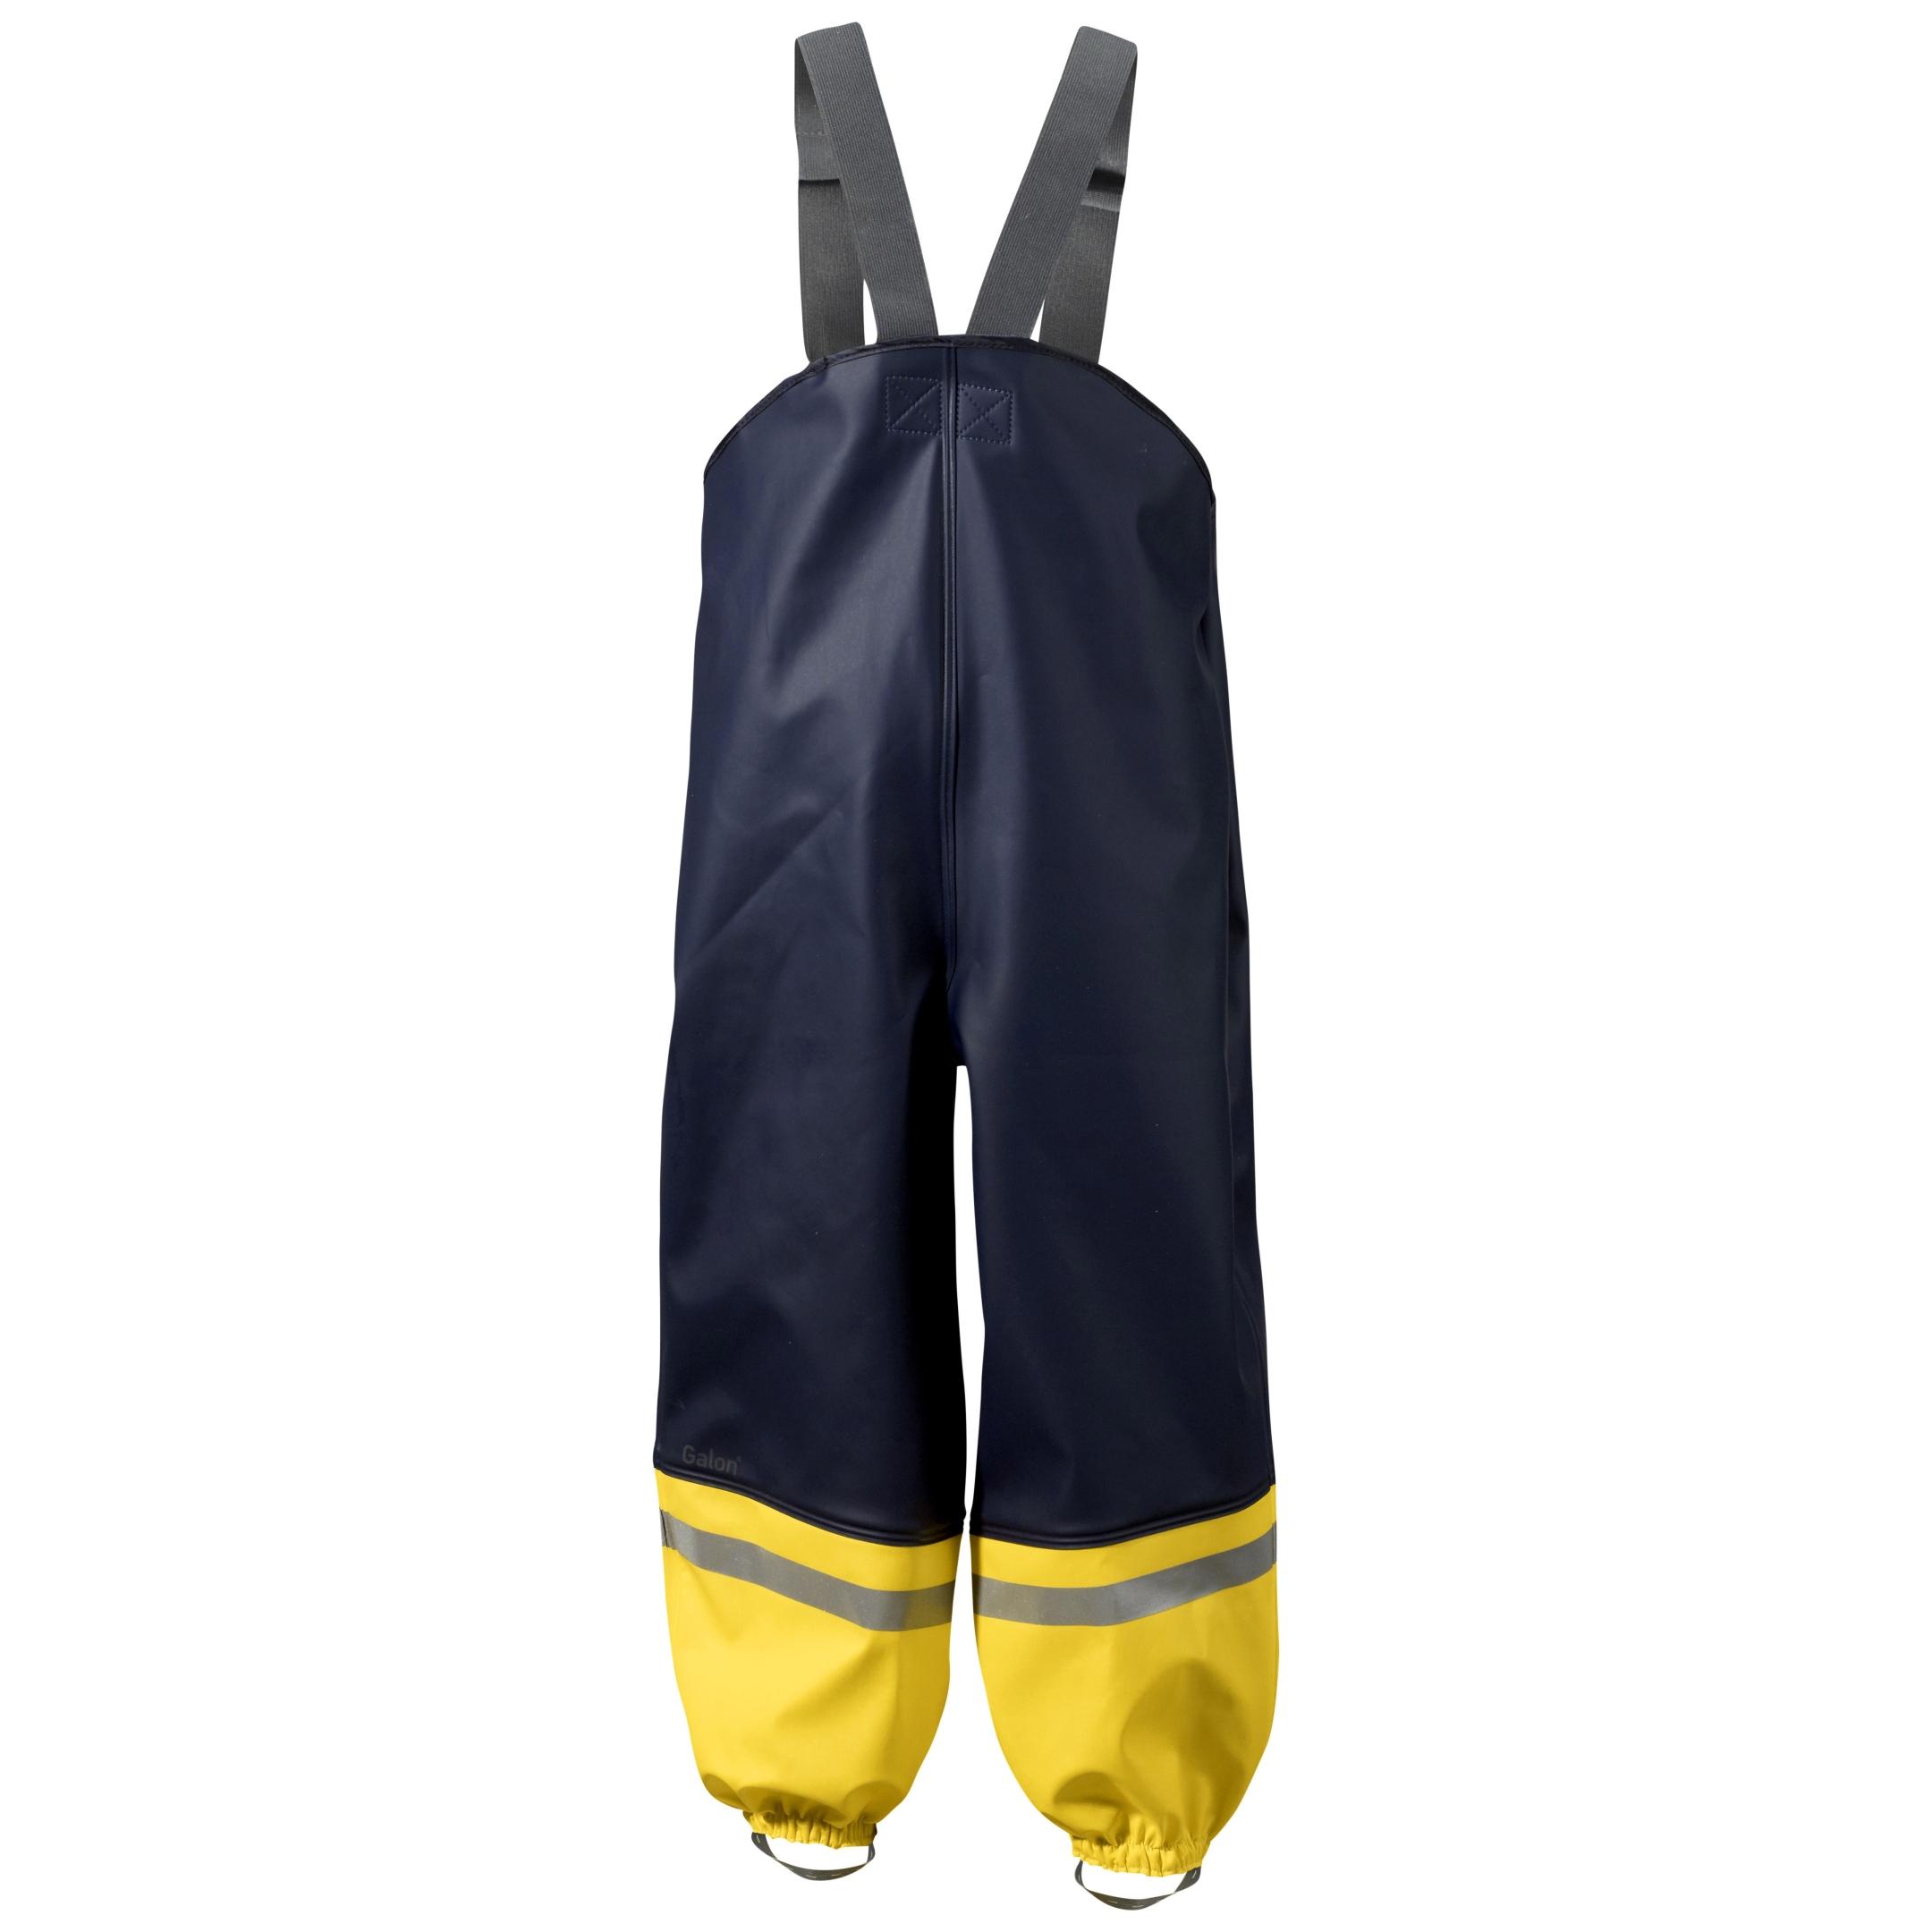 Дидриксон детский костюм дождевой WATERMAN + средство для стирки, - фото 7